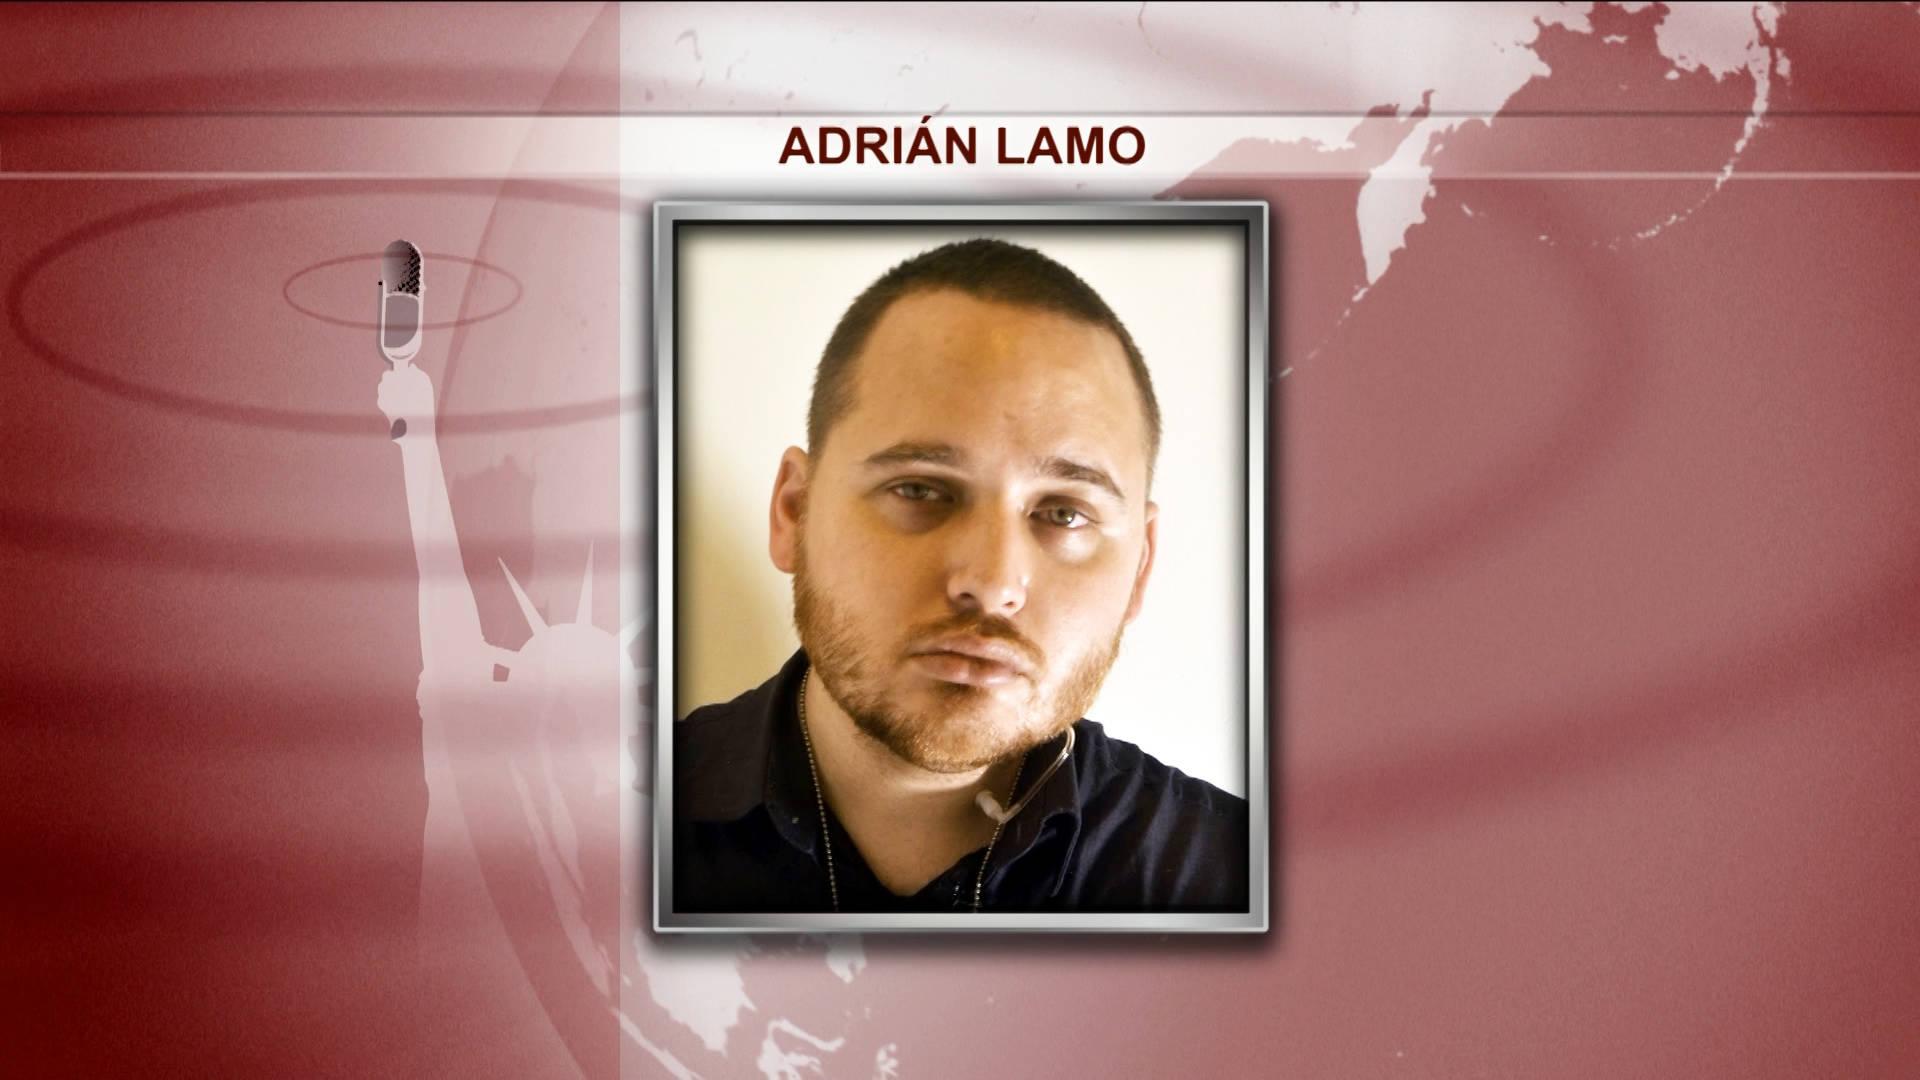 Adrian Lamo Story